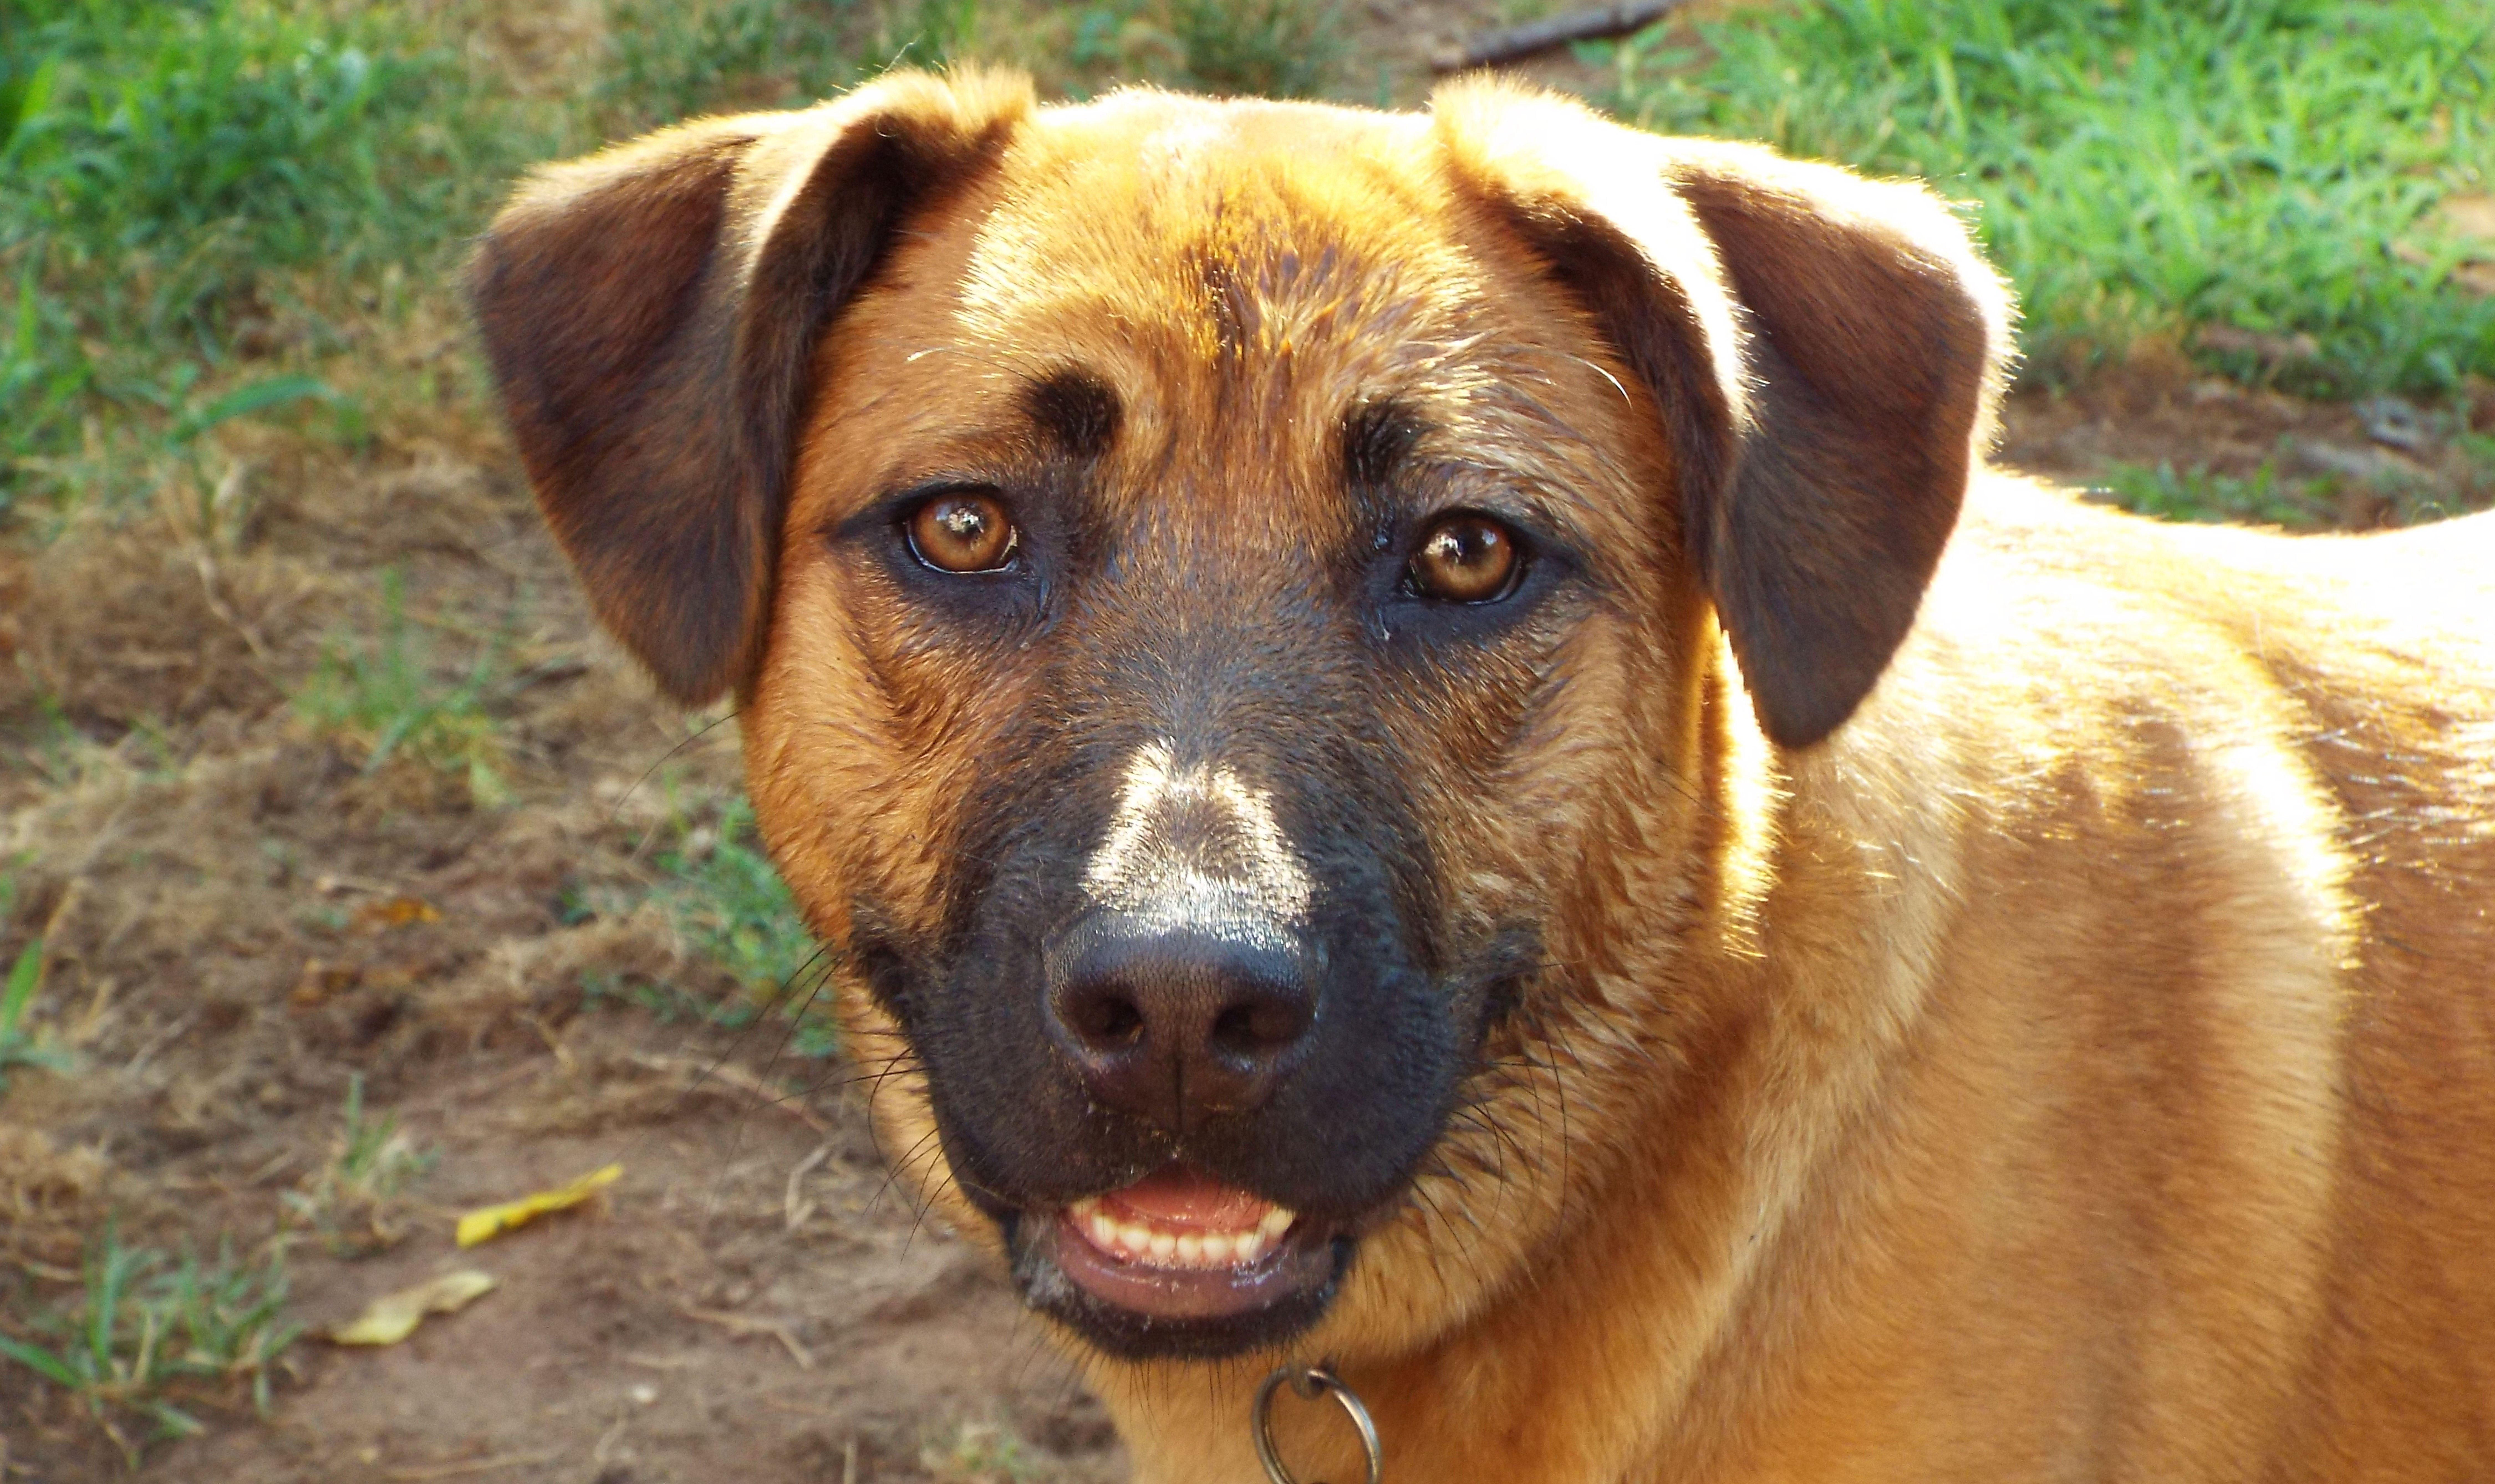 Black Mouth Cur Dog Breed Information Pictures Dogtime In 2020 Black Mouth Cur Black Mouth Cur Dog Dog Breeds